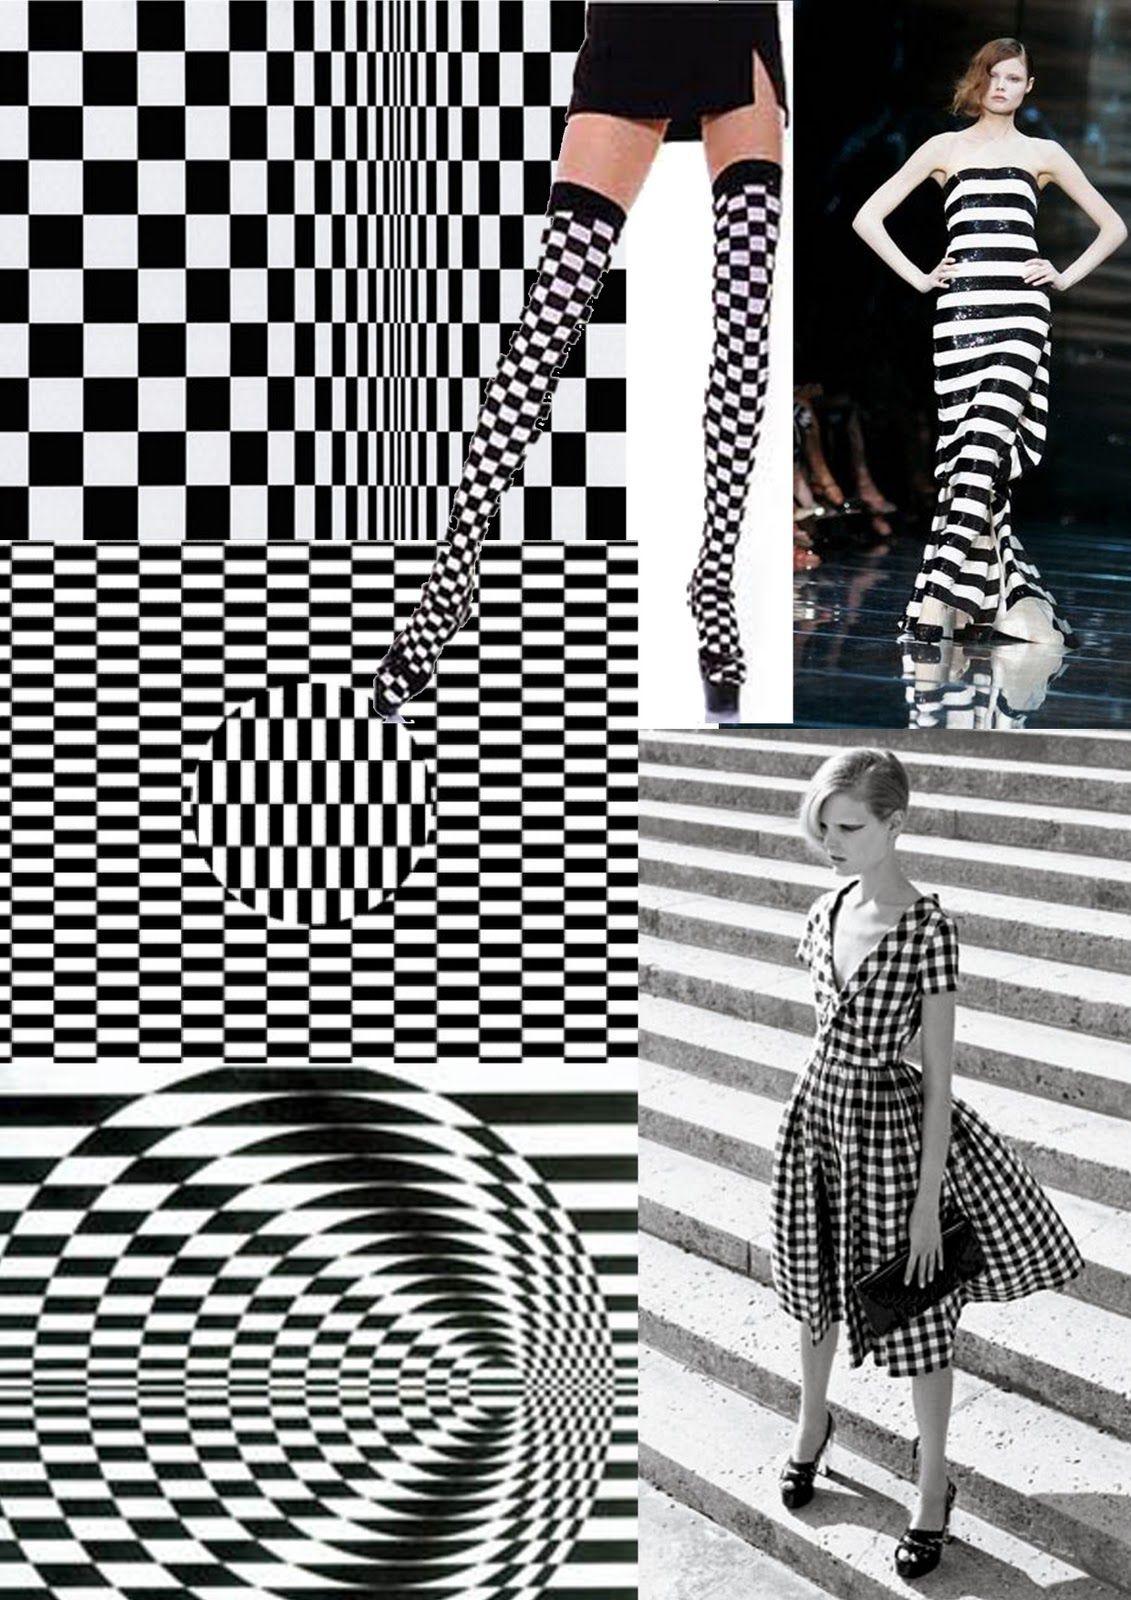 :::: ♡ ♤ ✿⊱╮☼ ☾ PINTEREST.COM christiancross ☀❤•♥•*[†]⁂ ⦿ ⥾ ⦿ ⁂ ::::bridget riley influence 60s fashion